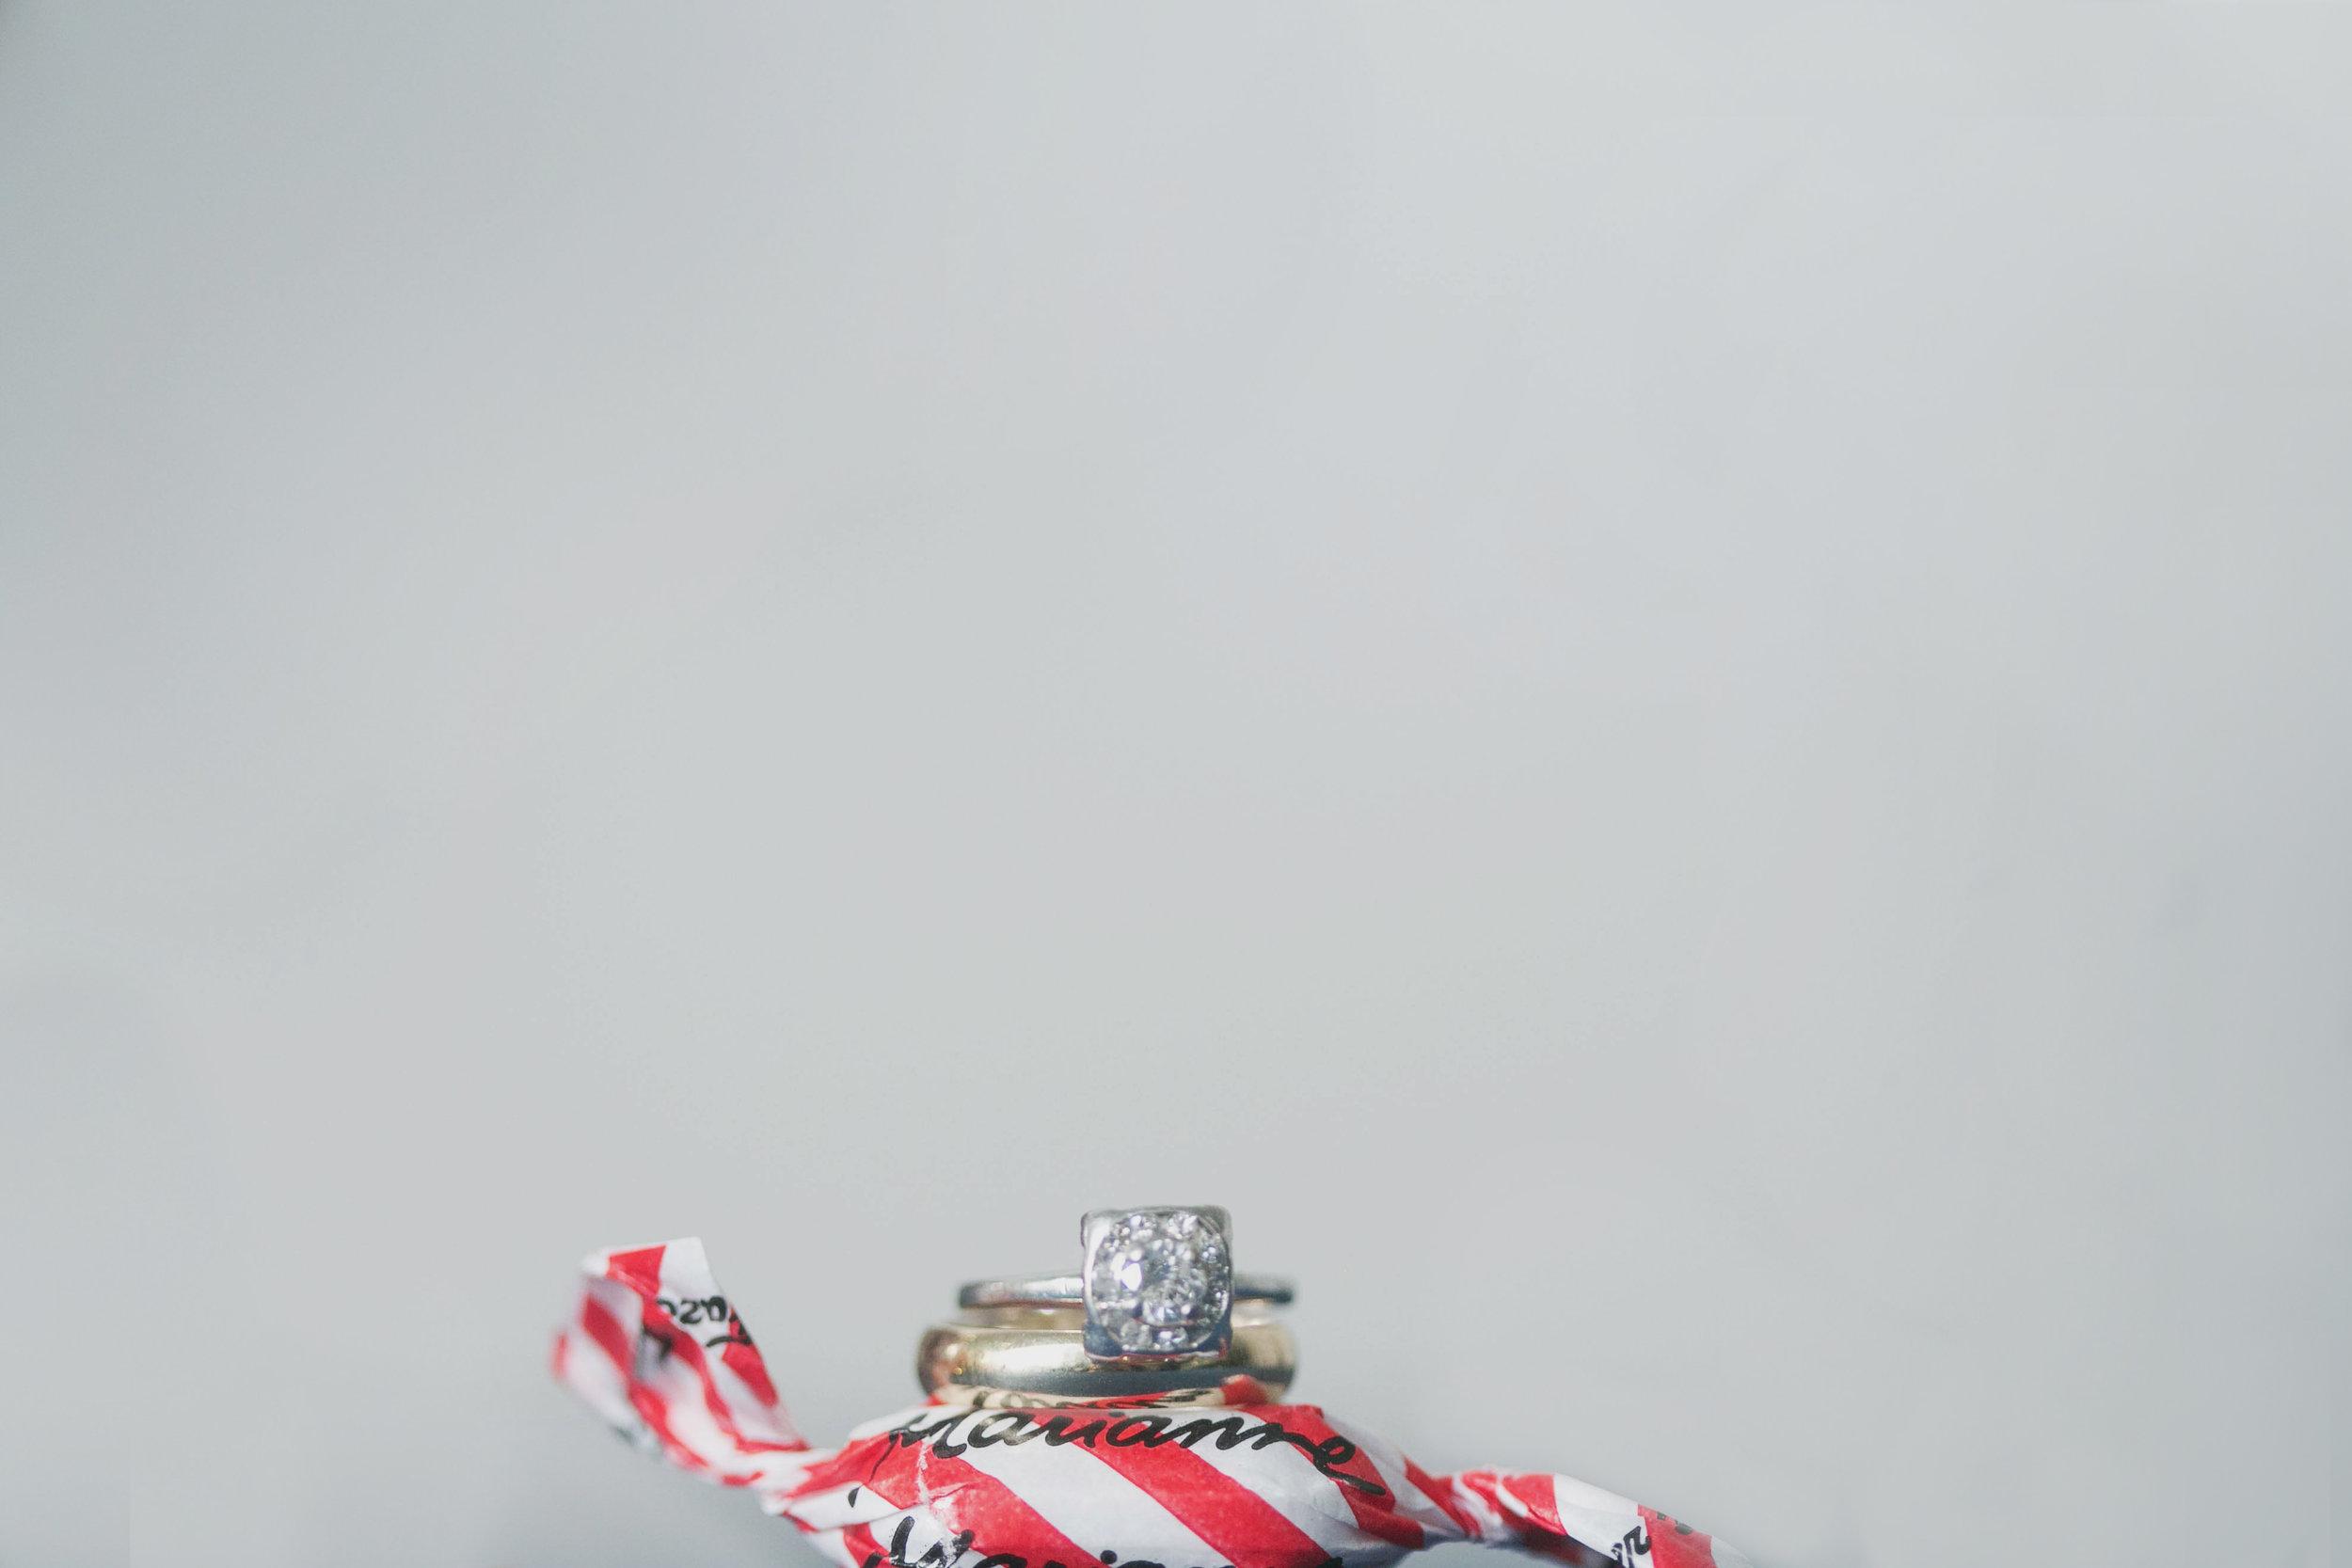 Simply-Charming-Socials_Atlanta-Wedding-Planner_Our-Labor-Of-Love_Emily-and-Jon_30.jpg